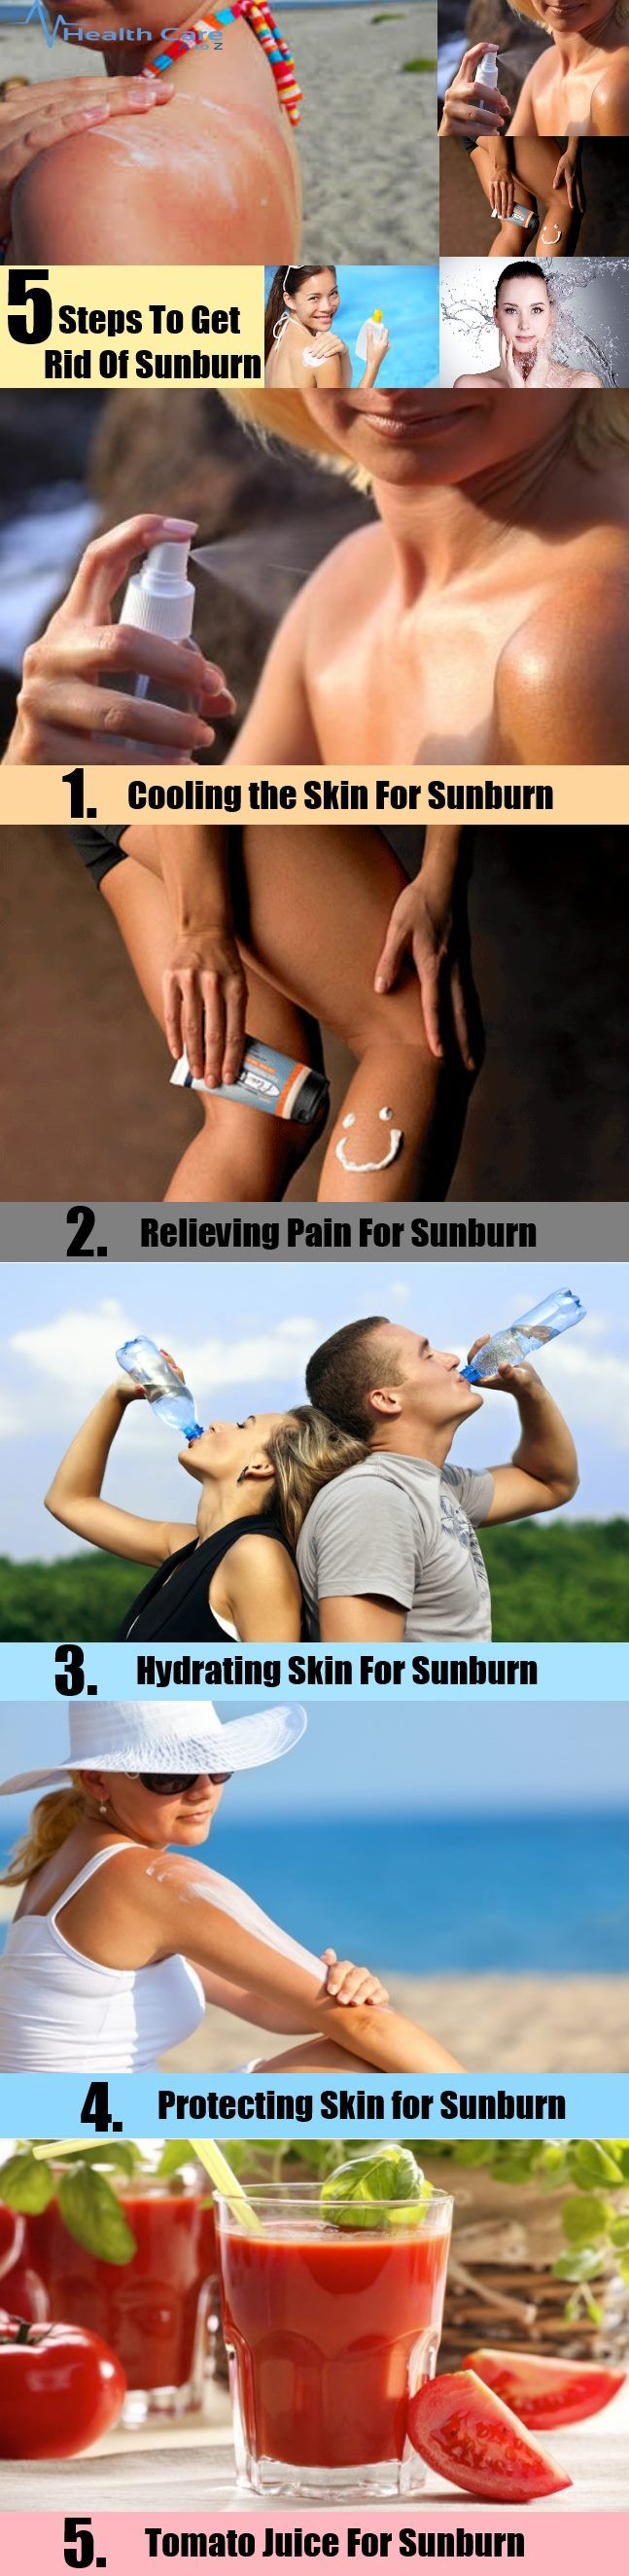 How To Get Rid Of Sunburn - 5 Easy Steps